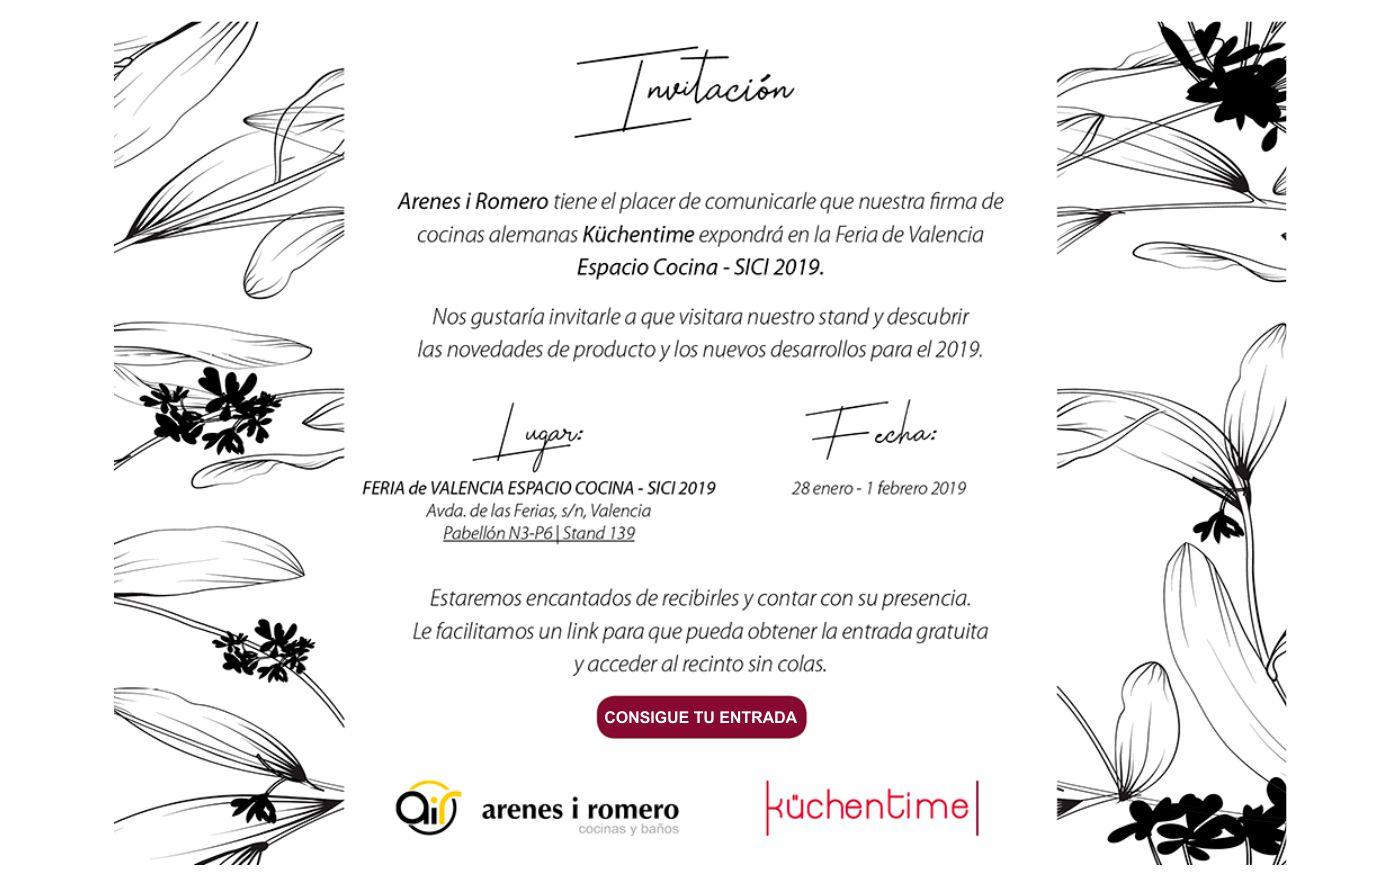 Invitación a Espacio Cocina - SICI 2019 en Valencia